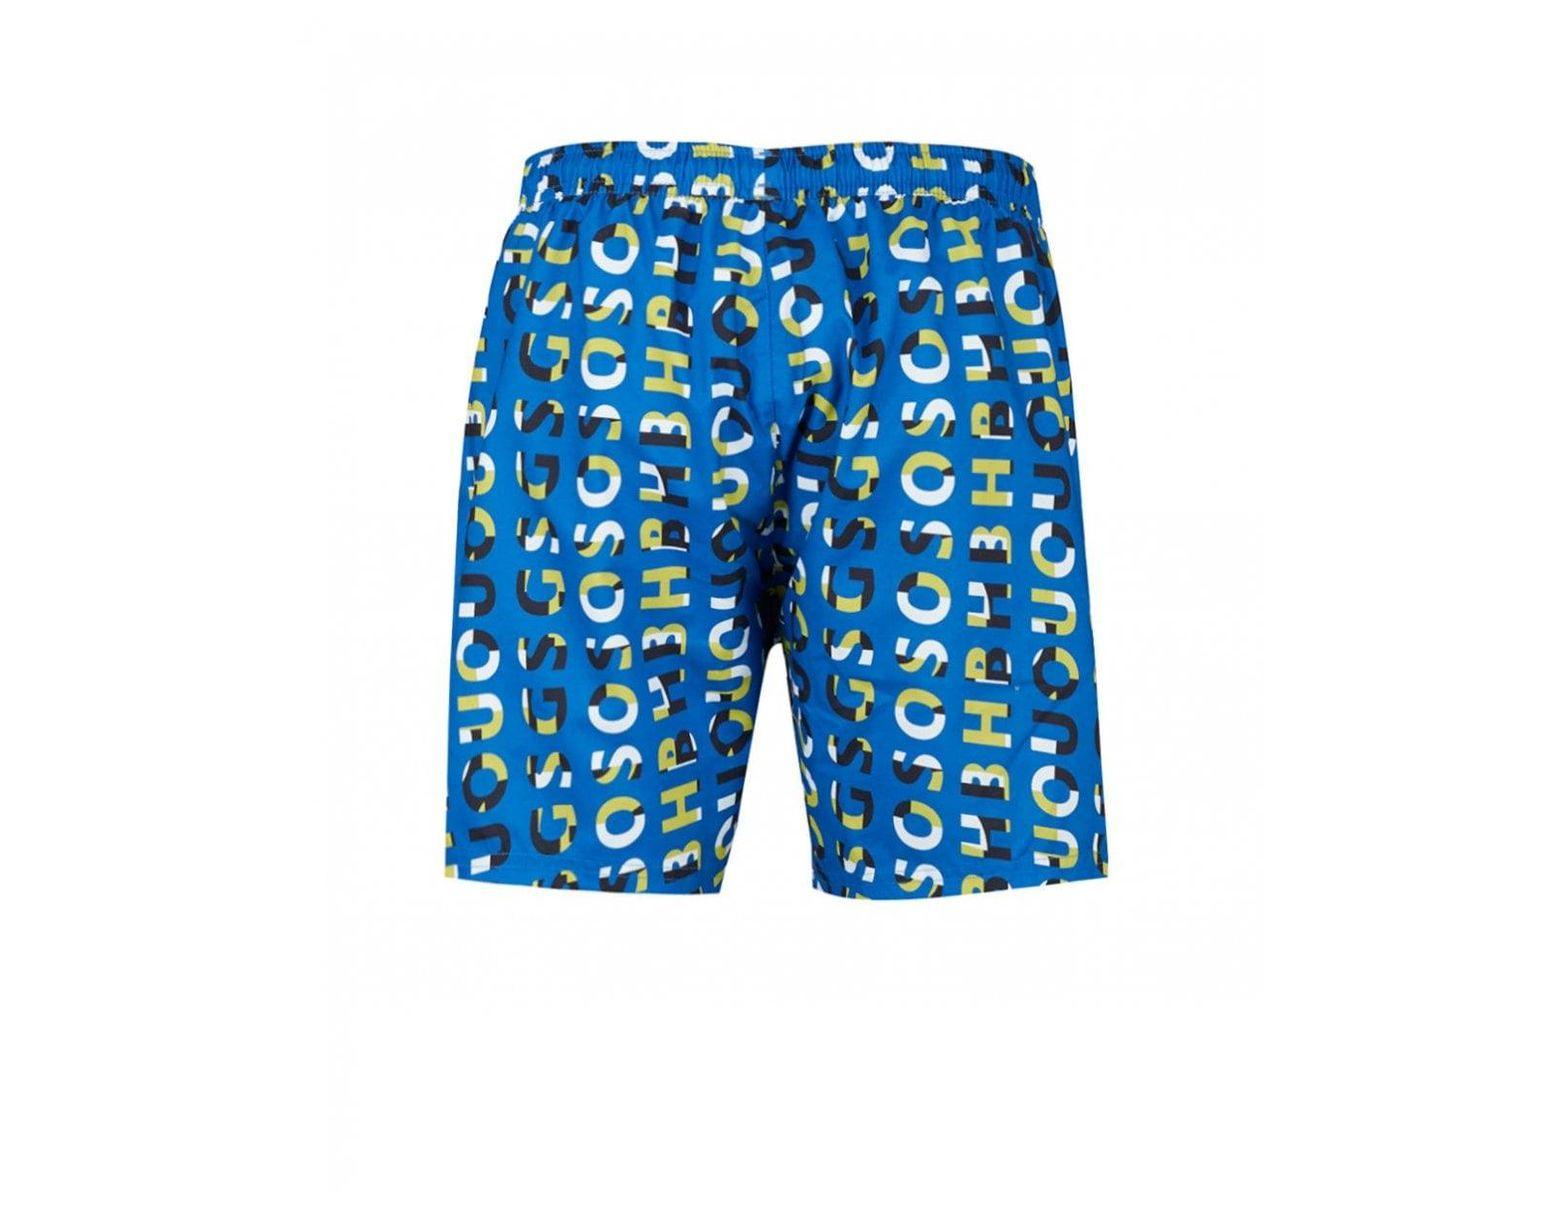 d5624dfc2b BOSS by Hugo Boss Piranha Allure Print Swim Shorts in Blue for Men ...